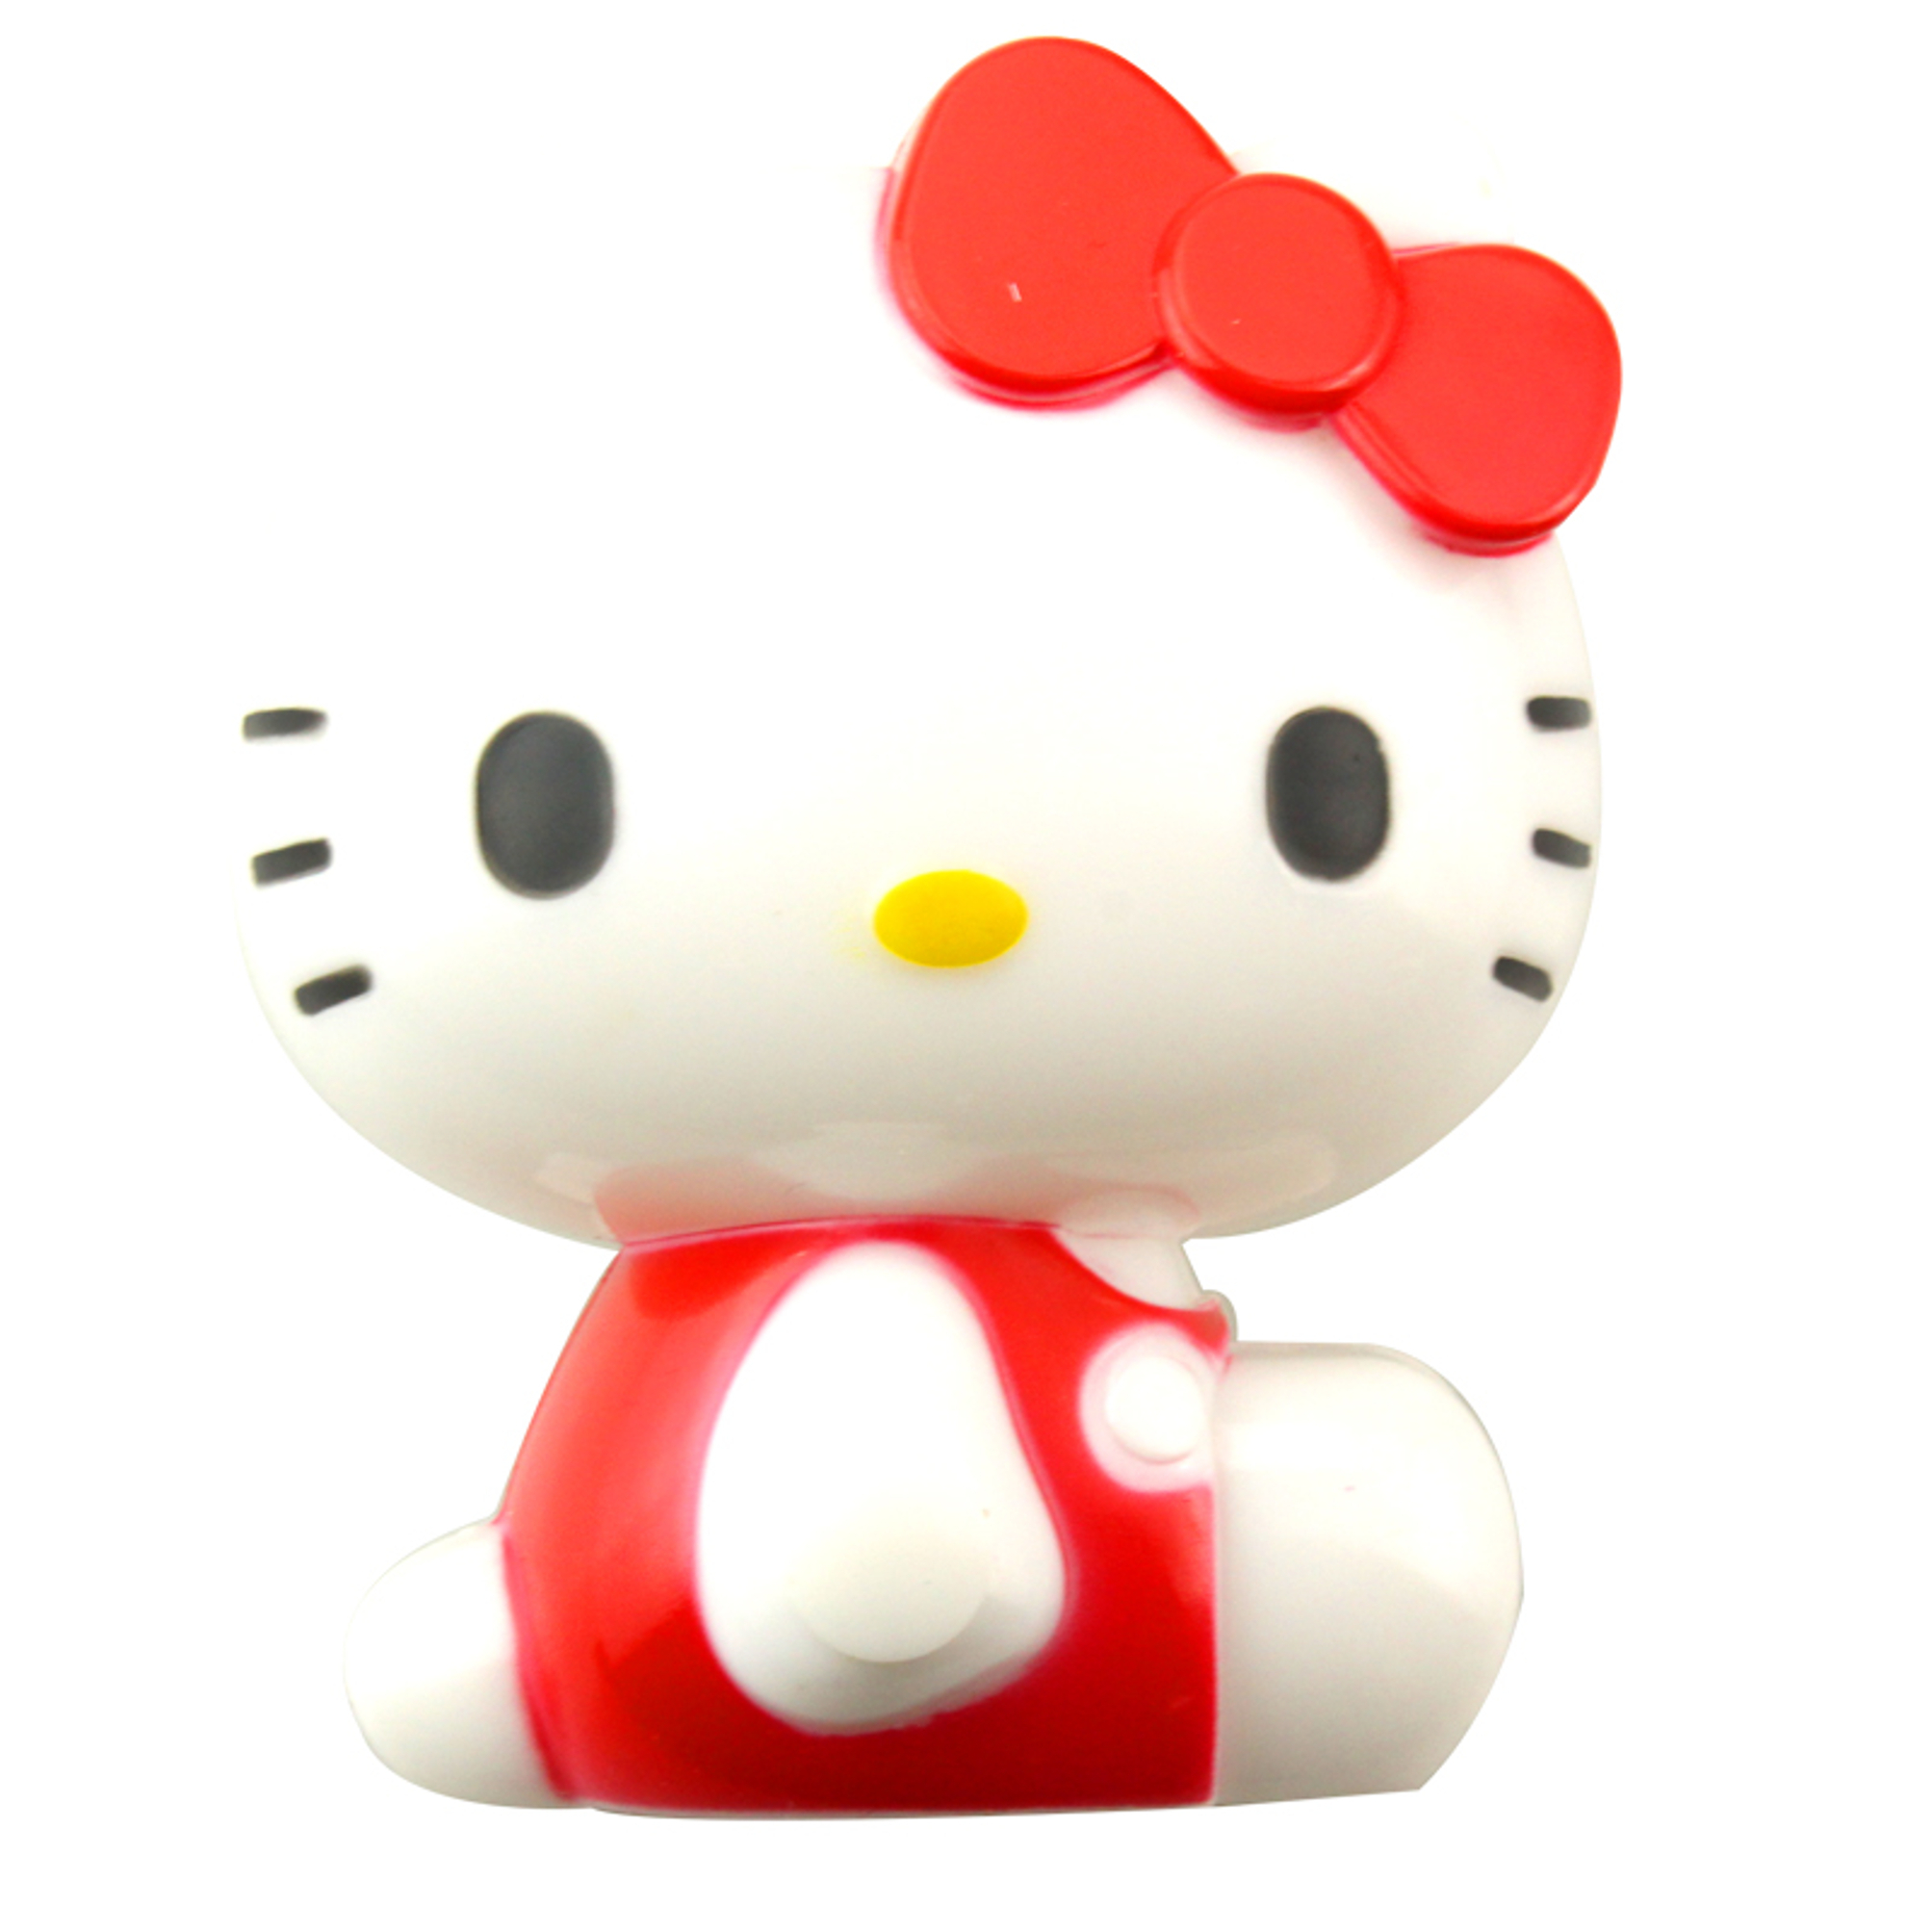 Sweetbaby Hello Kitty Style Nightlight Lamp With US Plug ...